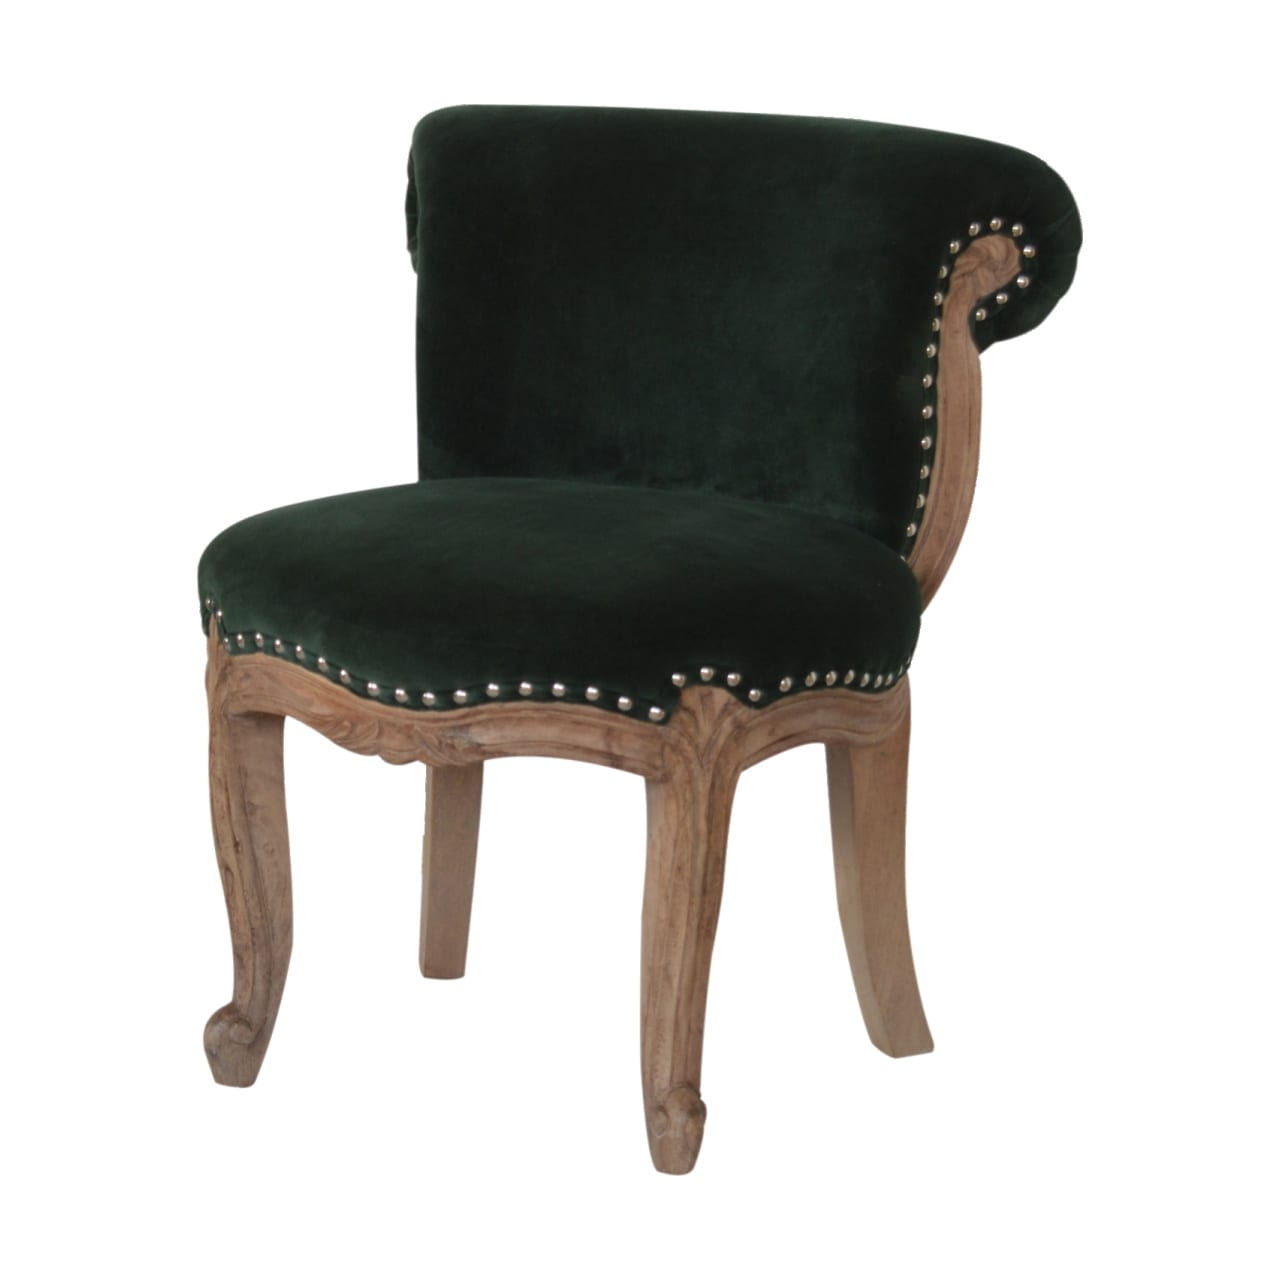 Emerald Green Velvet Studded Chair Scottish Antique Arts Centre